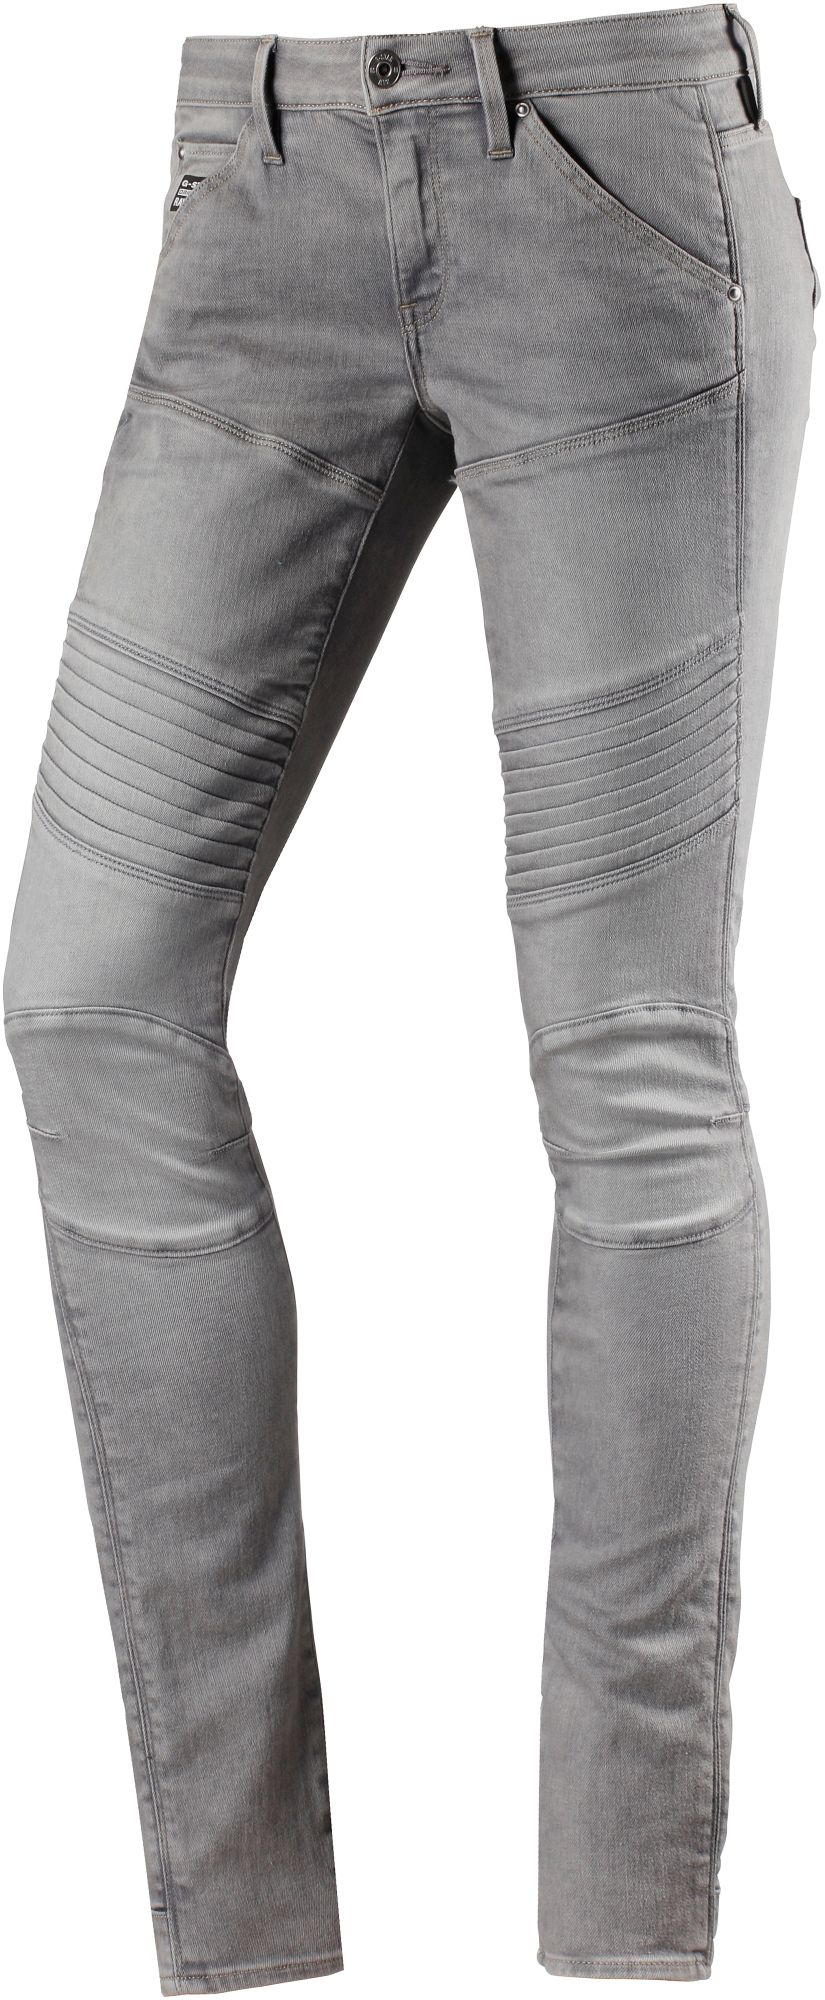 5620 Custom Mid Skinny Fit Jeans Damen in grey denim, Größe 26 / 32